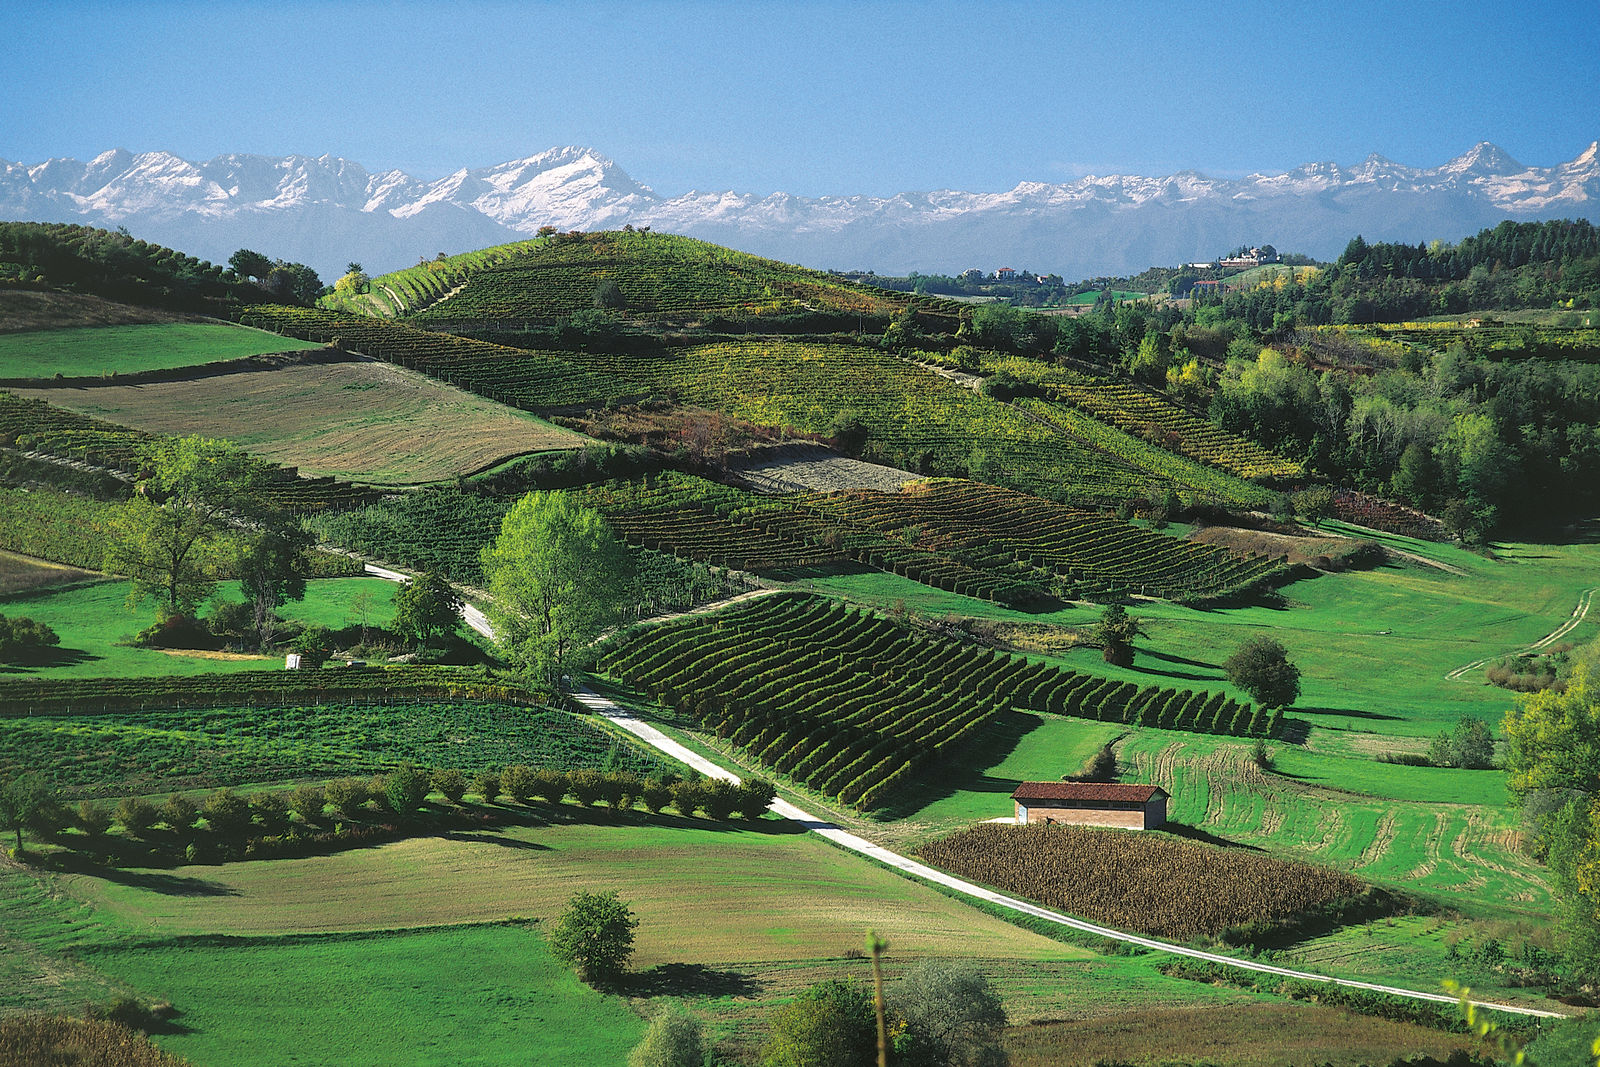 Aosta en Aostadal: mooi en nog heerlijk rustig | AmbianceTravel